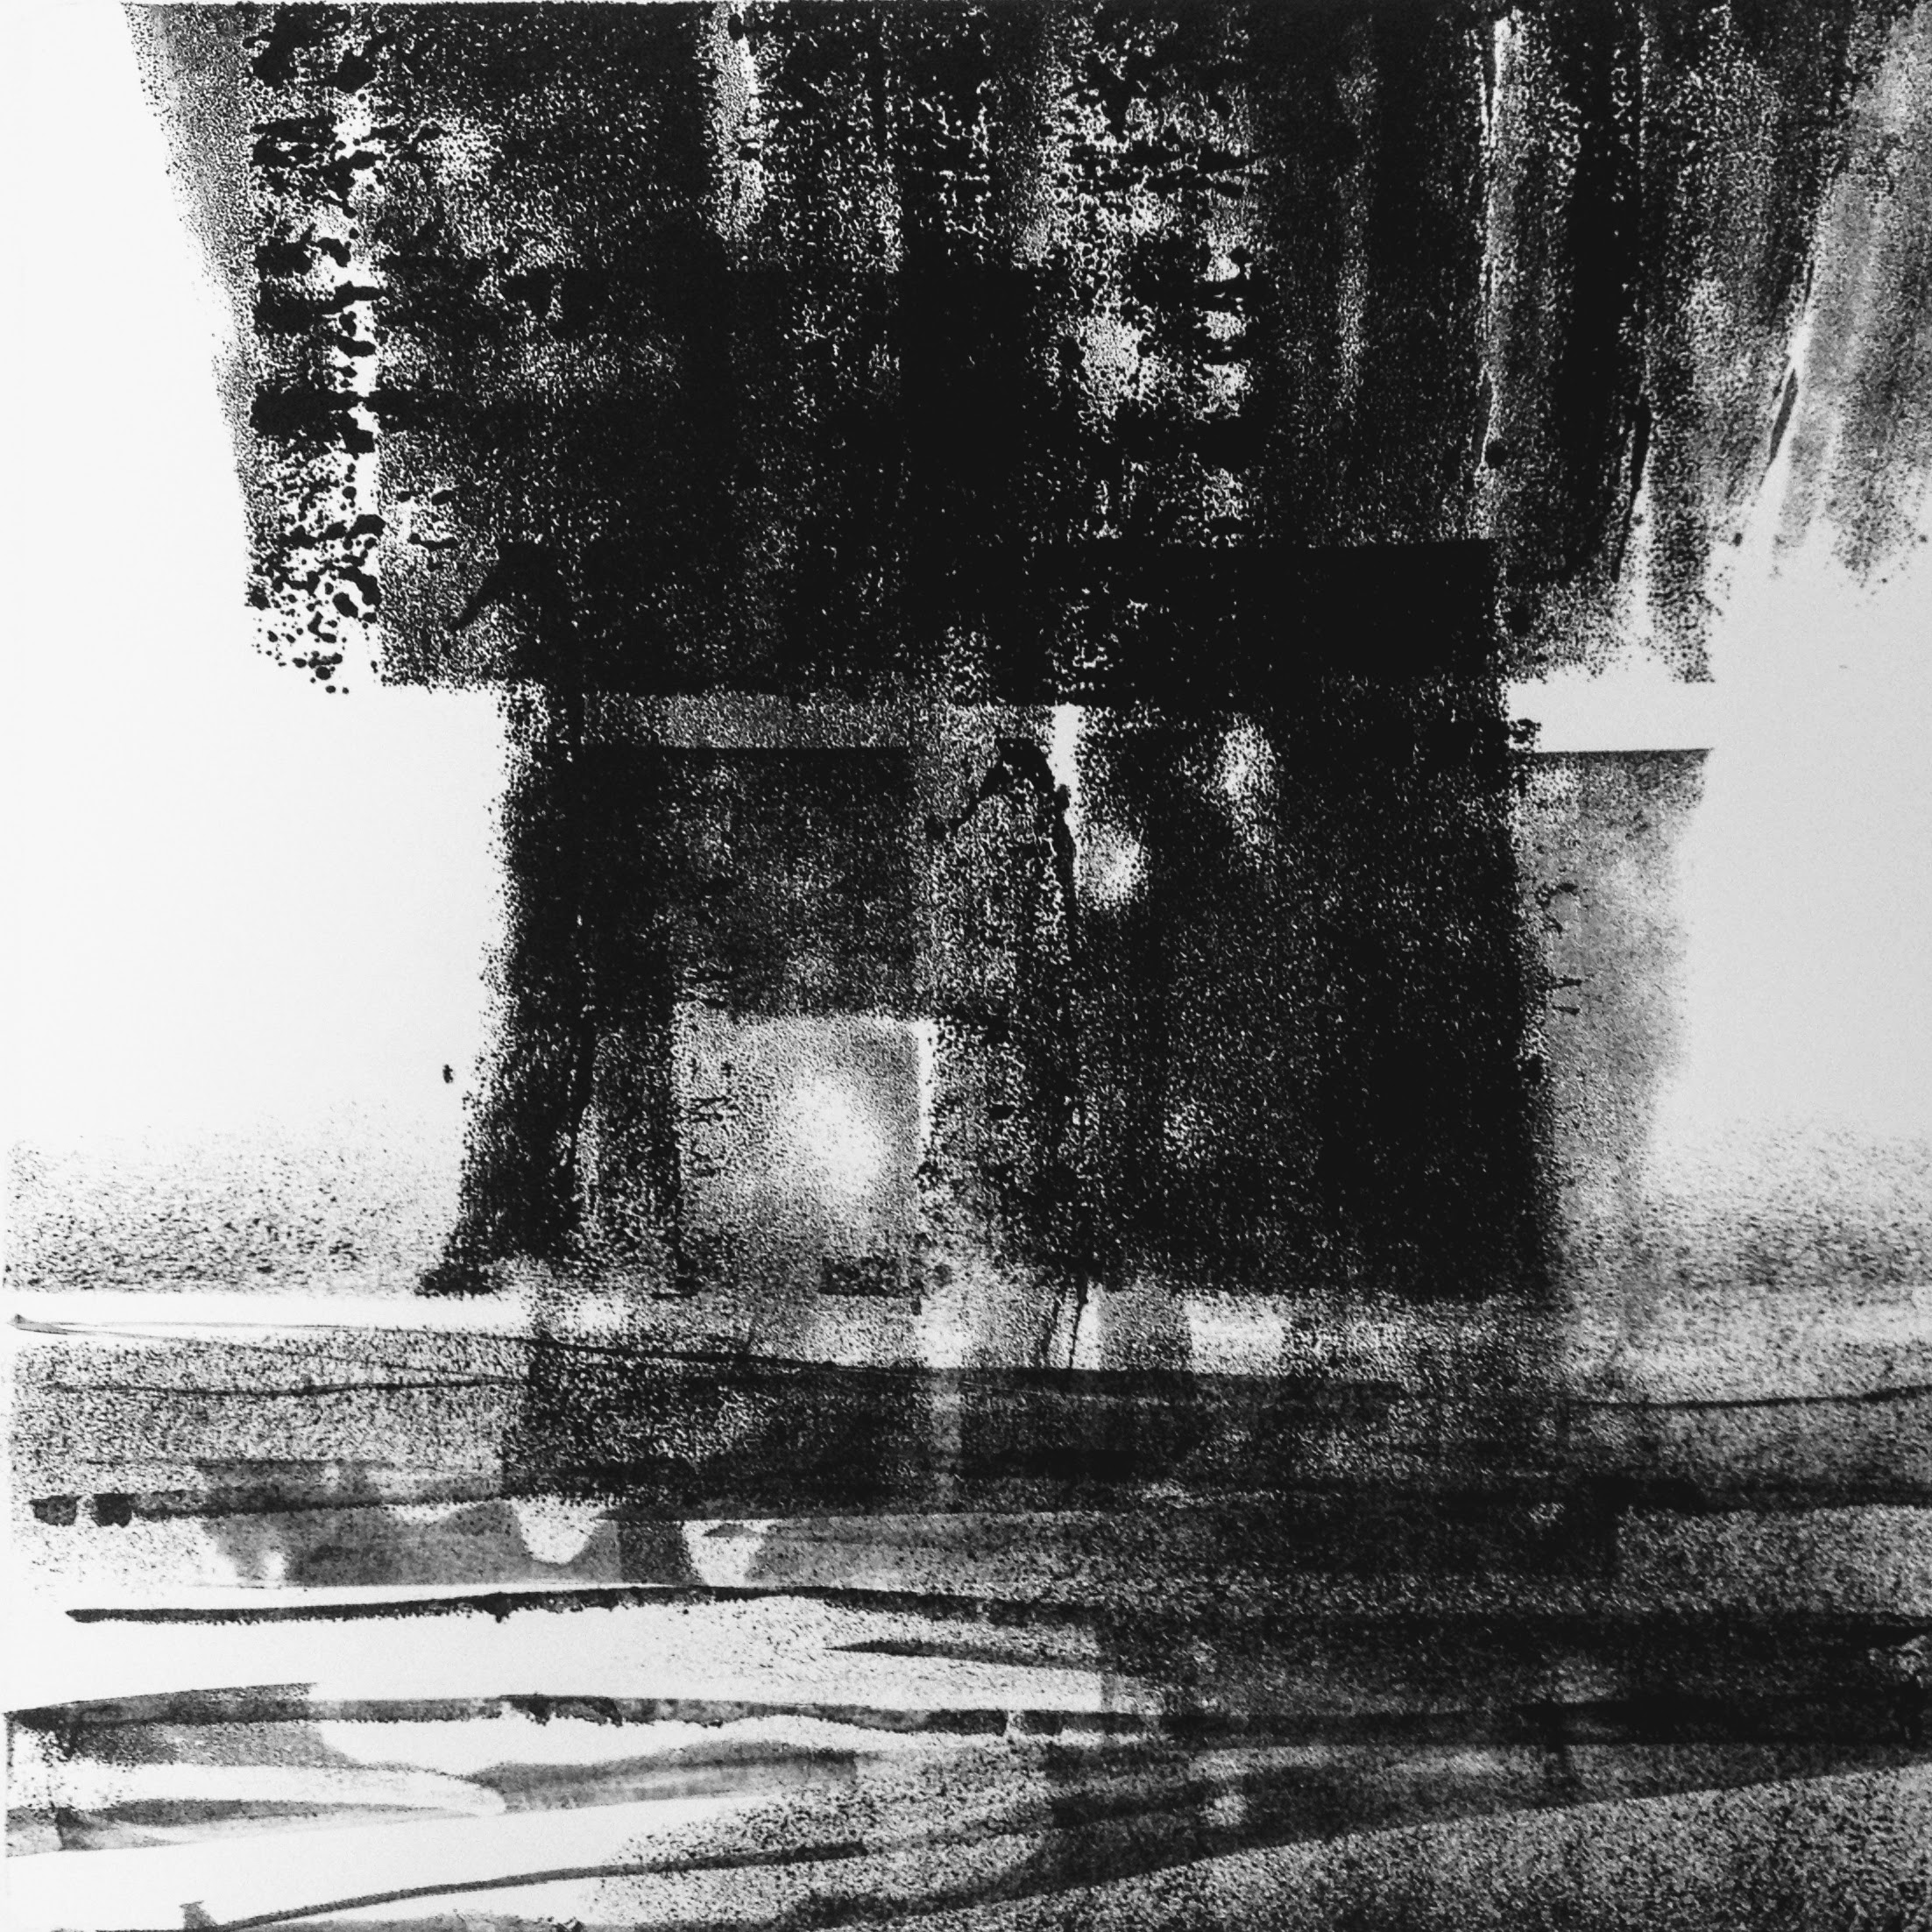 Dark Skies I, monotype, 2017, 300x300mm, 250gm Somerset Satin